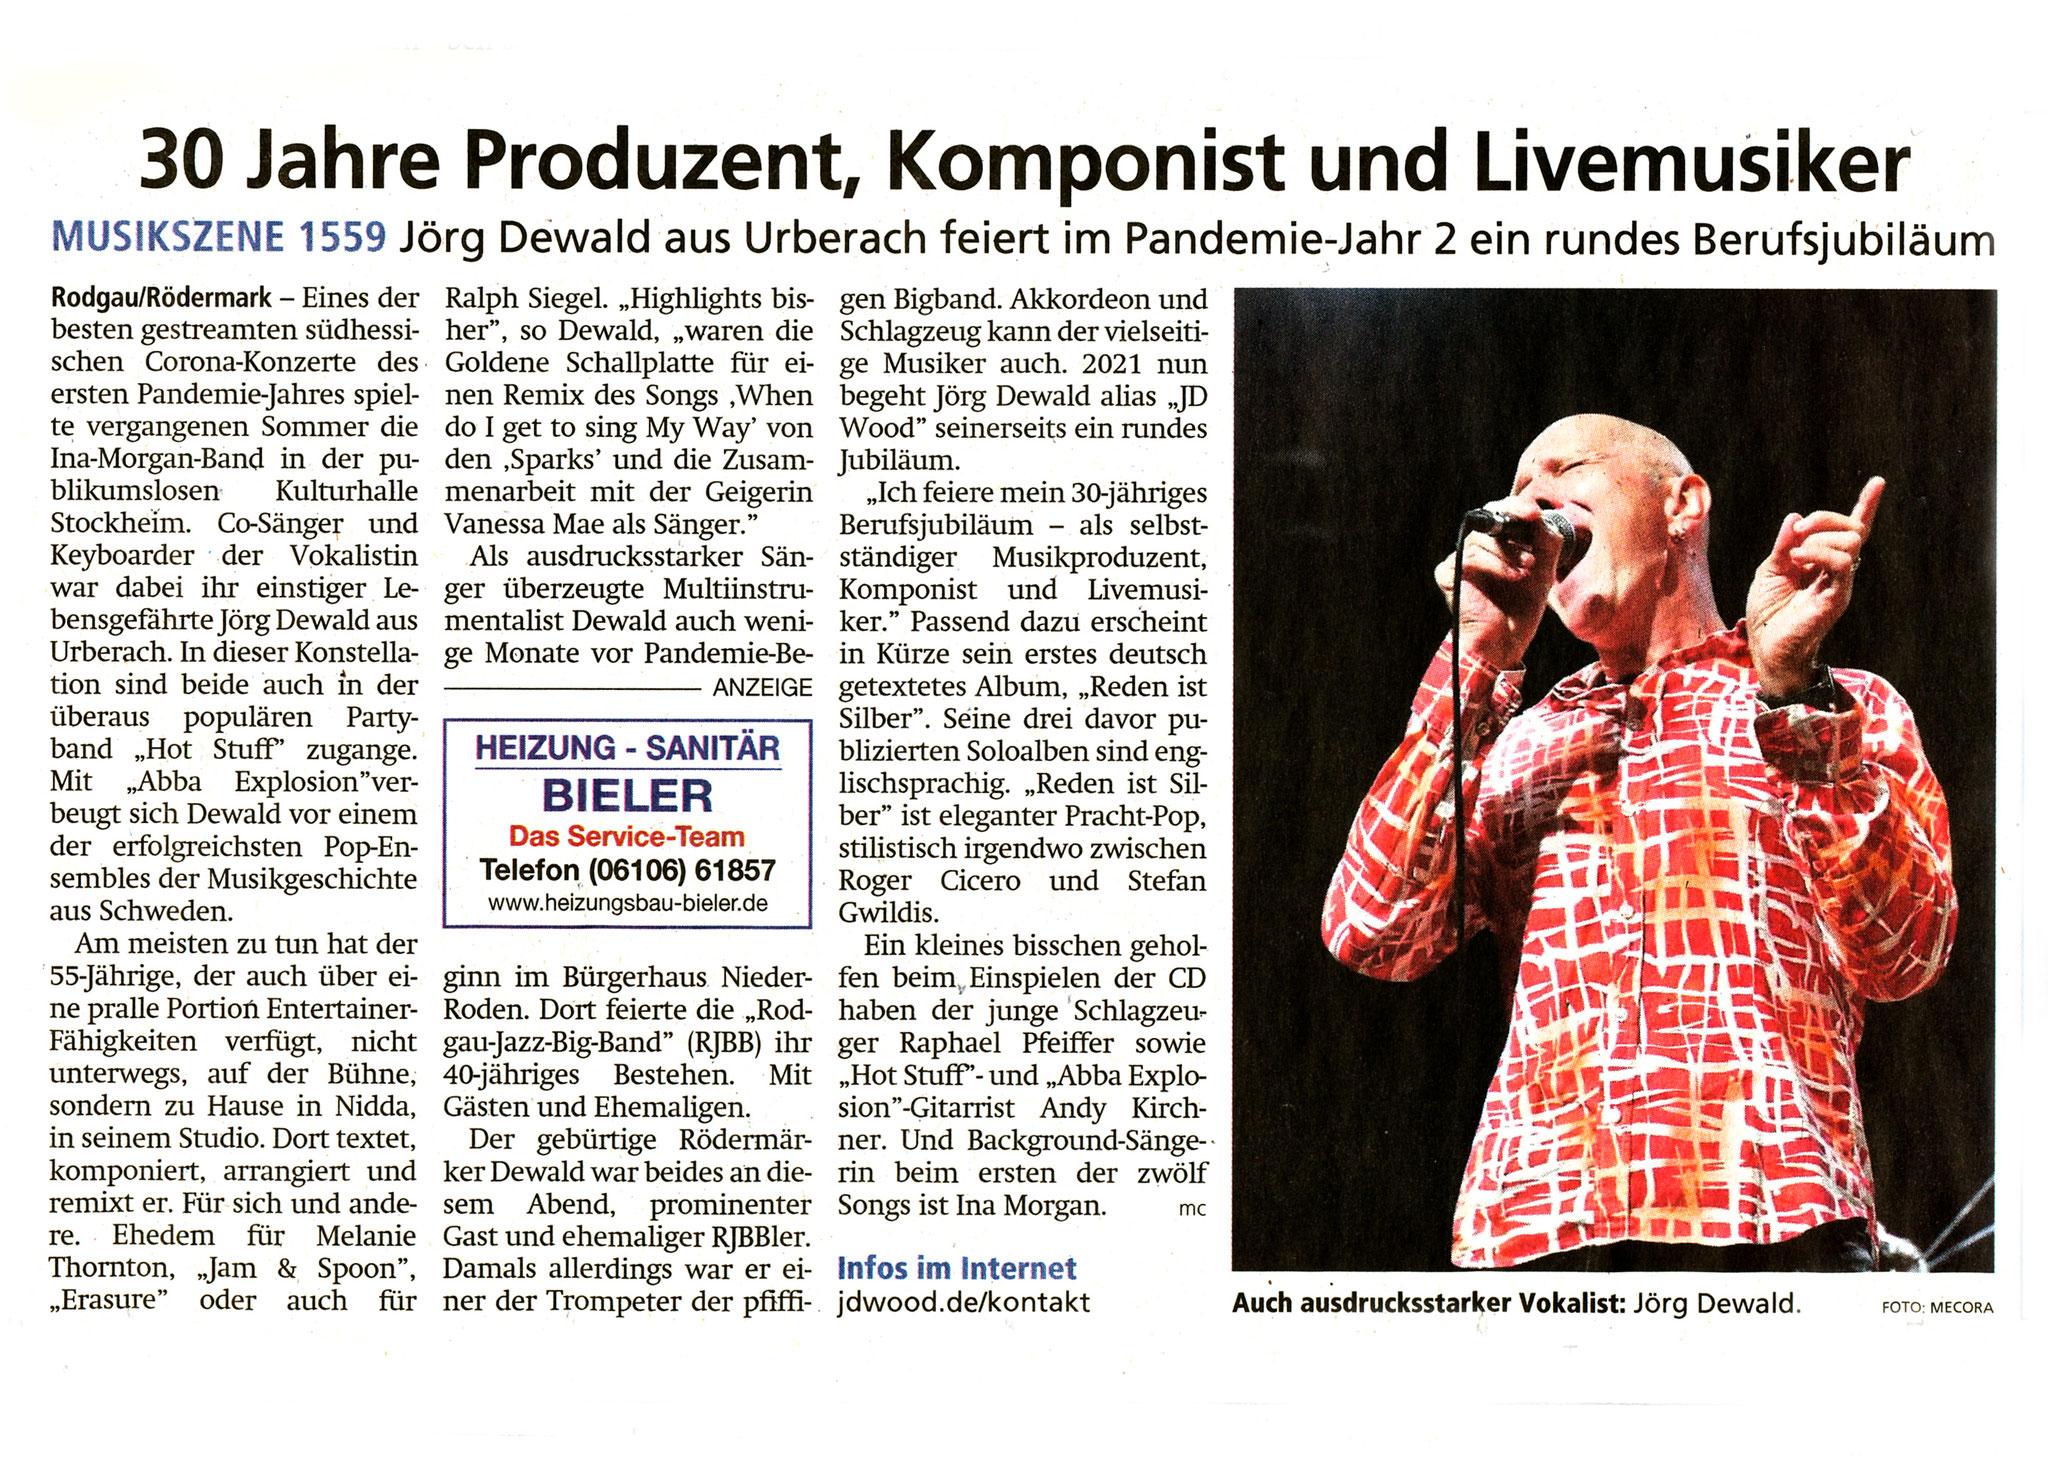 Artikel Offenbach Post, 24. April 2021